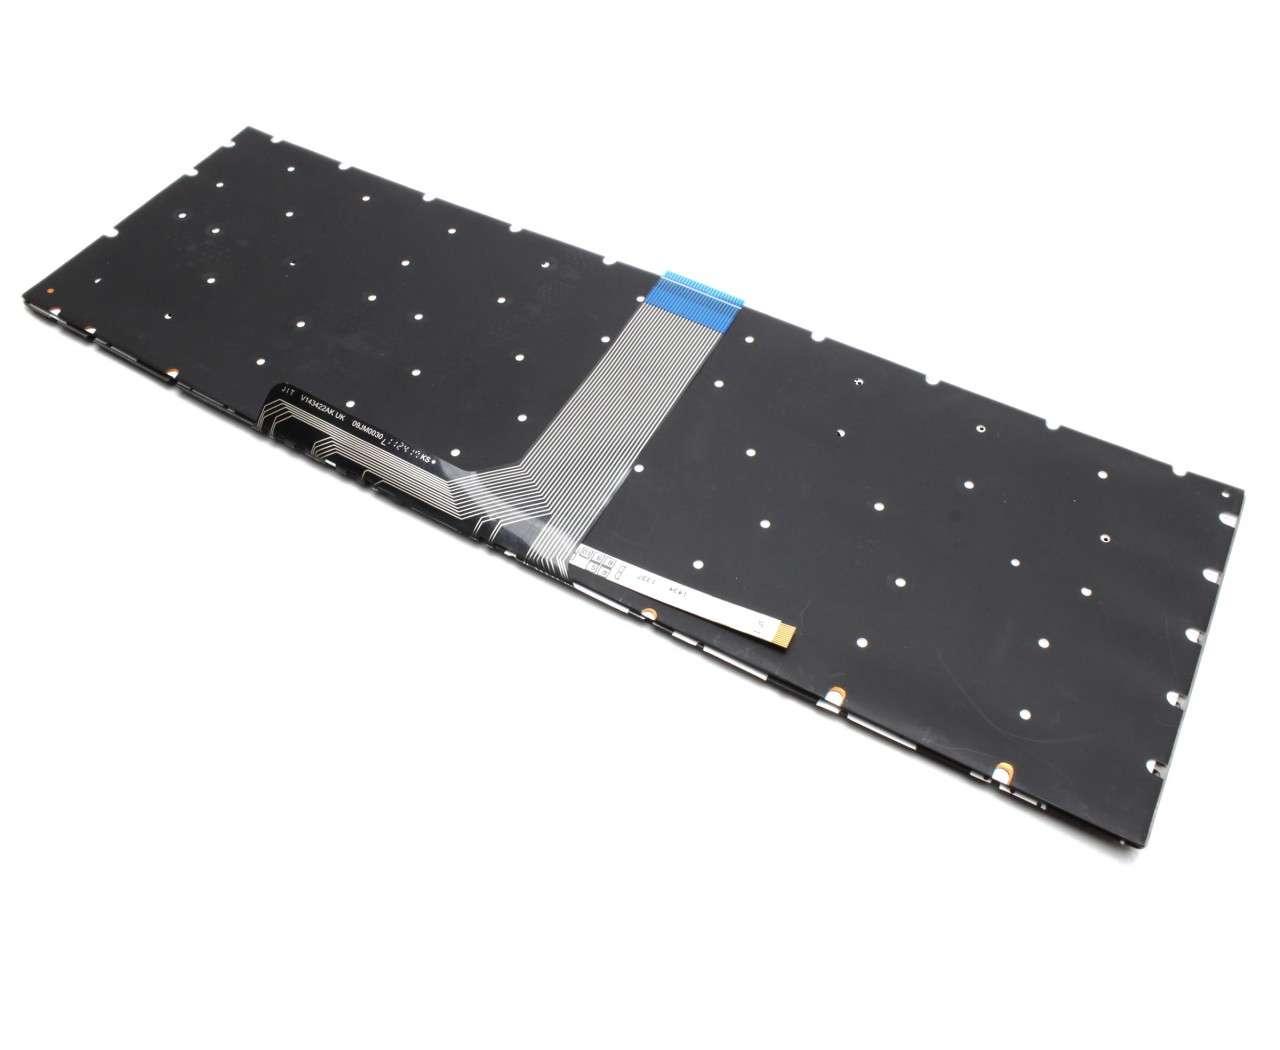 Tastatura MSI GE63VR 7RF Raider iluminata backlit imagine powerlaptop.ro 2021